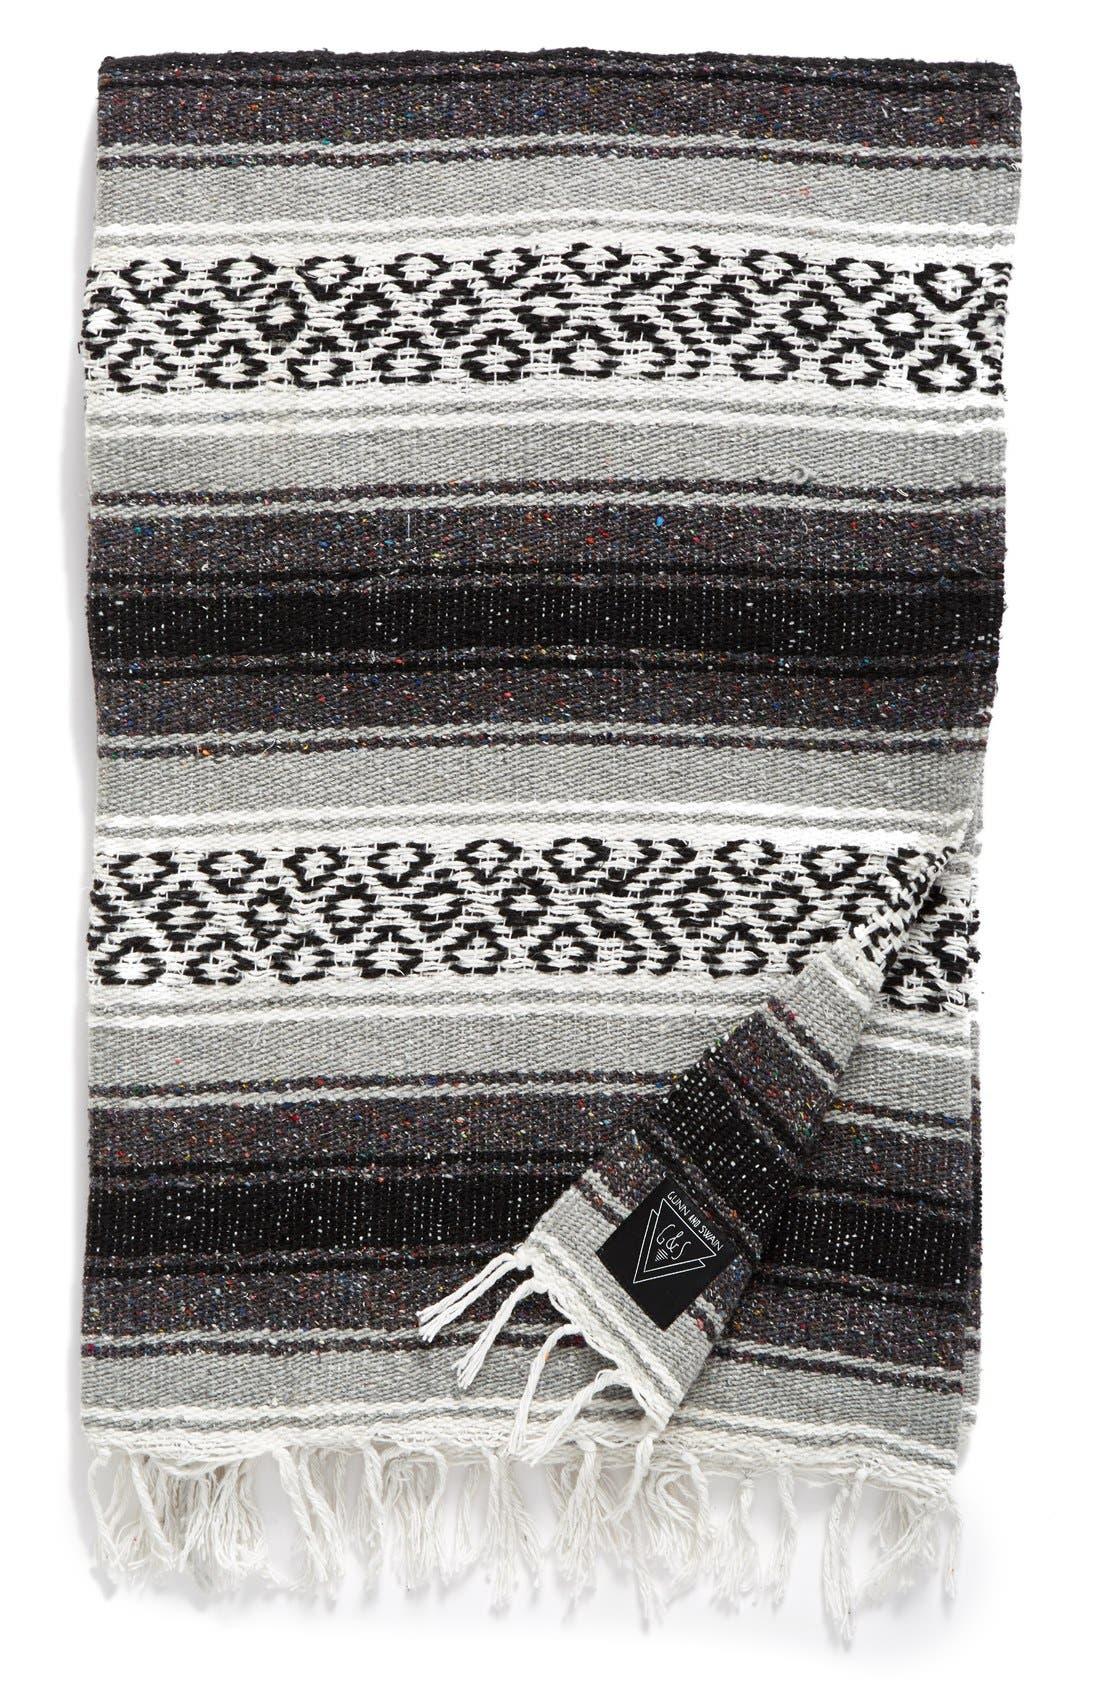 Alternate Image 1 Selected - Gunn & Swain Whitecap Throw